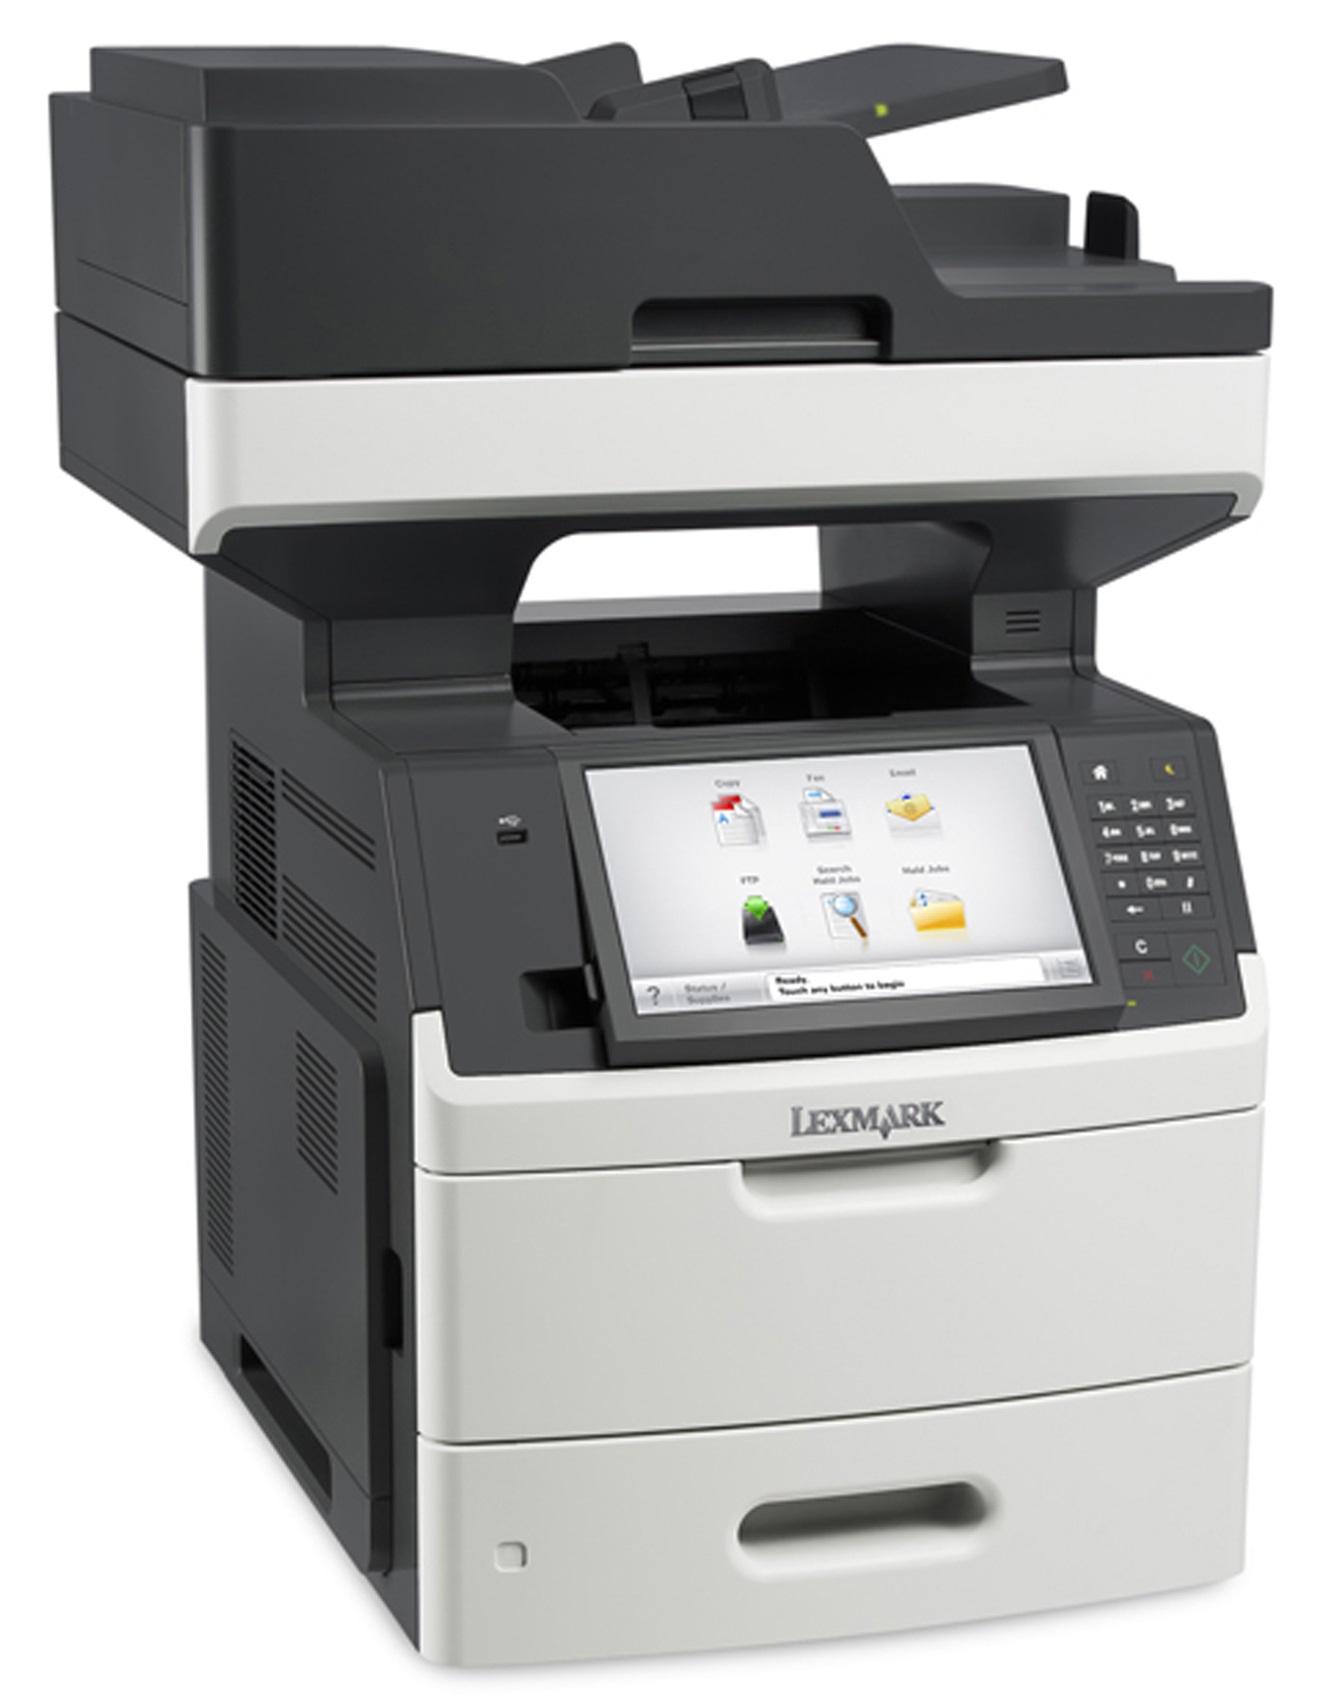 Driver for Lexmark MS610dte Printer Universal PCL5e